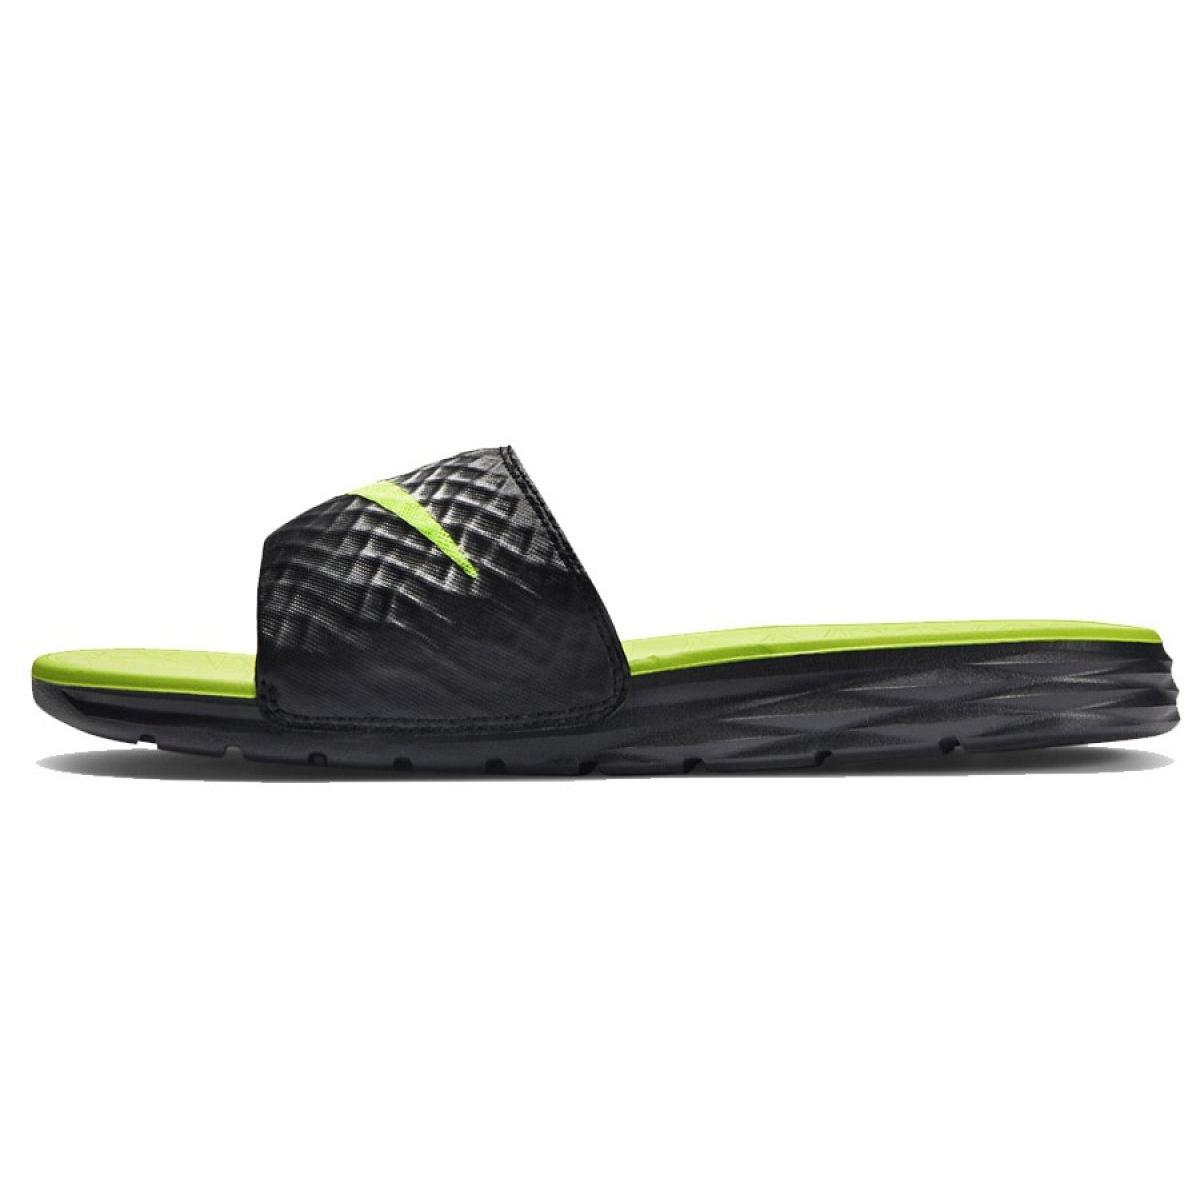 838e1fdbe3 Preto Chinelos Nike Benassi Solarsoft Slide 705474-070 - ButyModne.pl